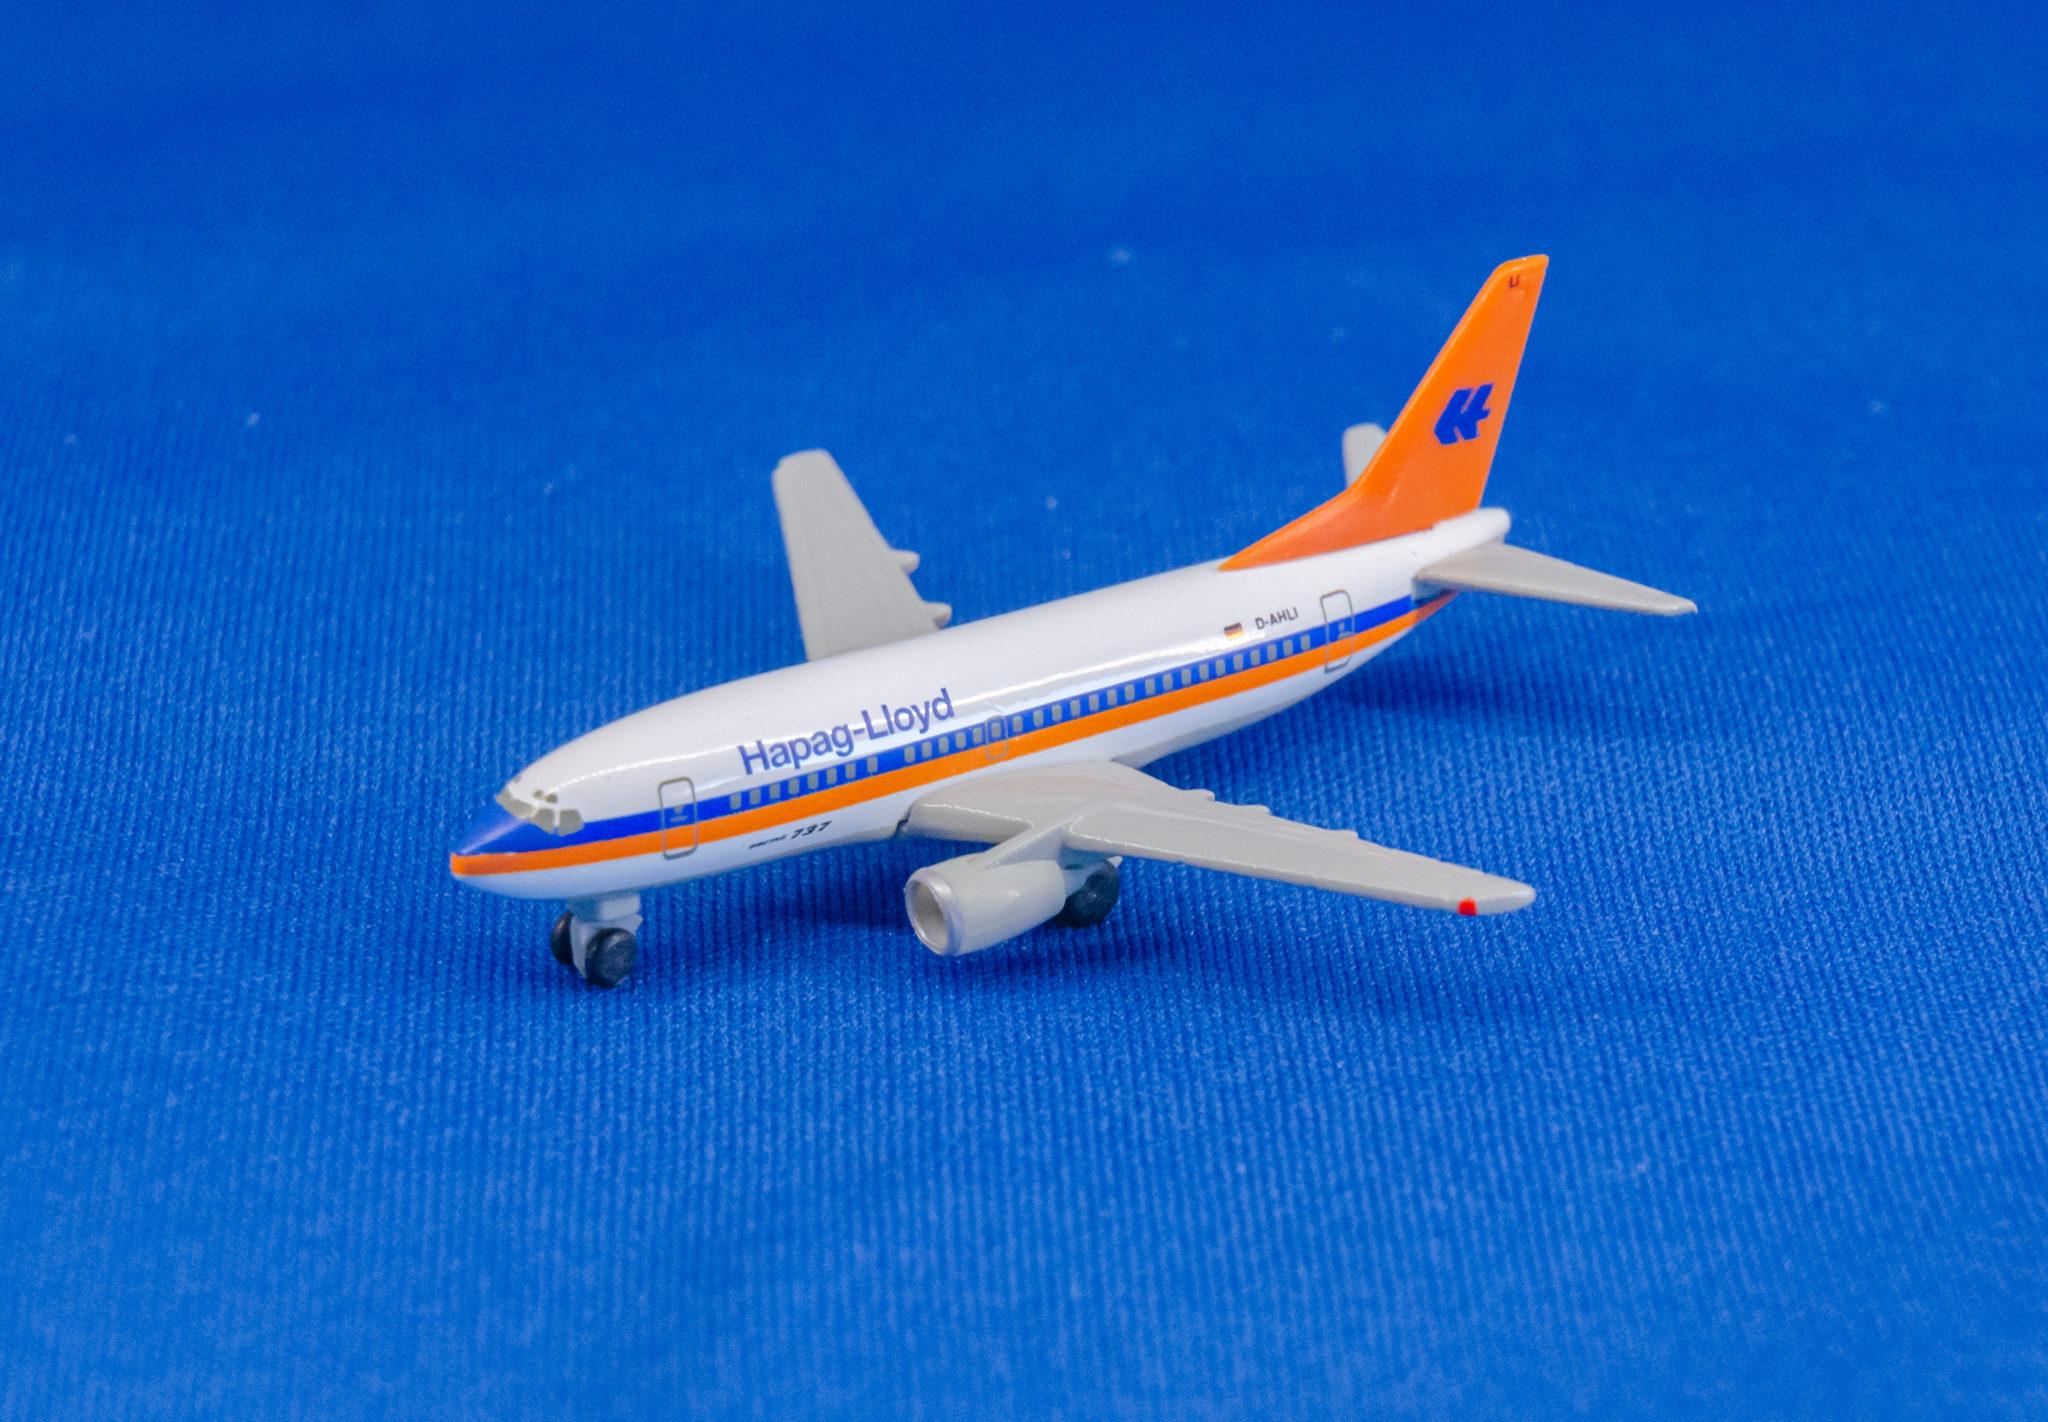 Herpa Hapag Lloyd Boeing 737 500 1 500 Der Flugplatz